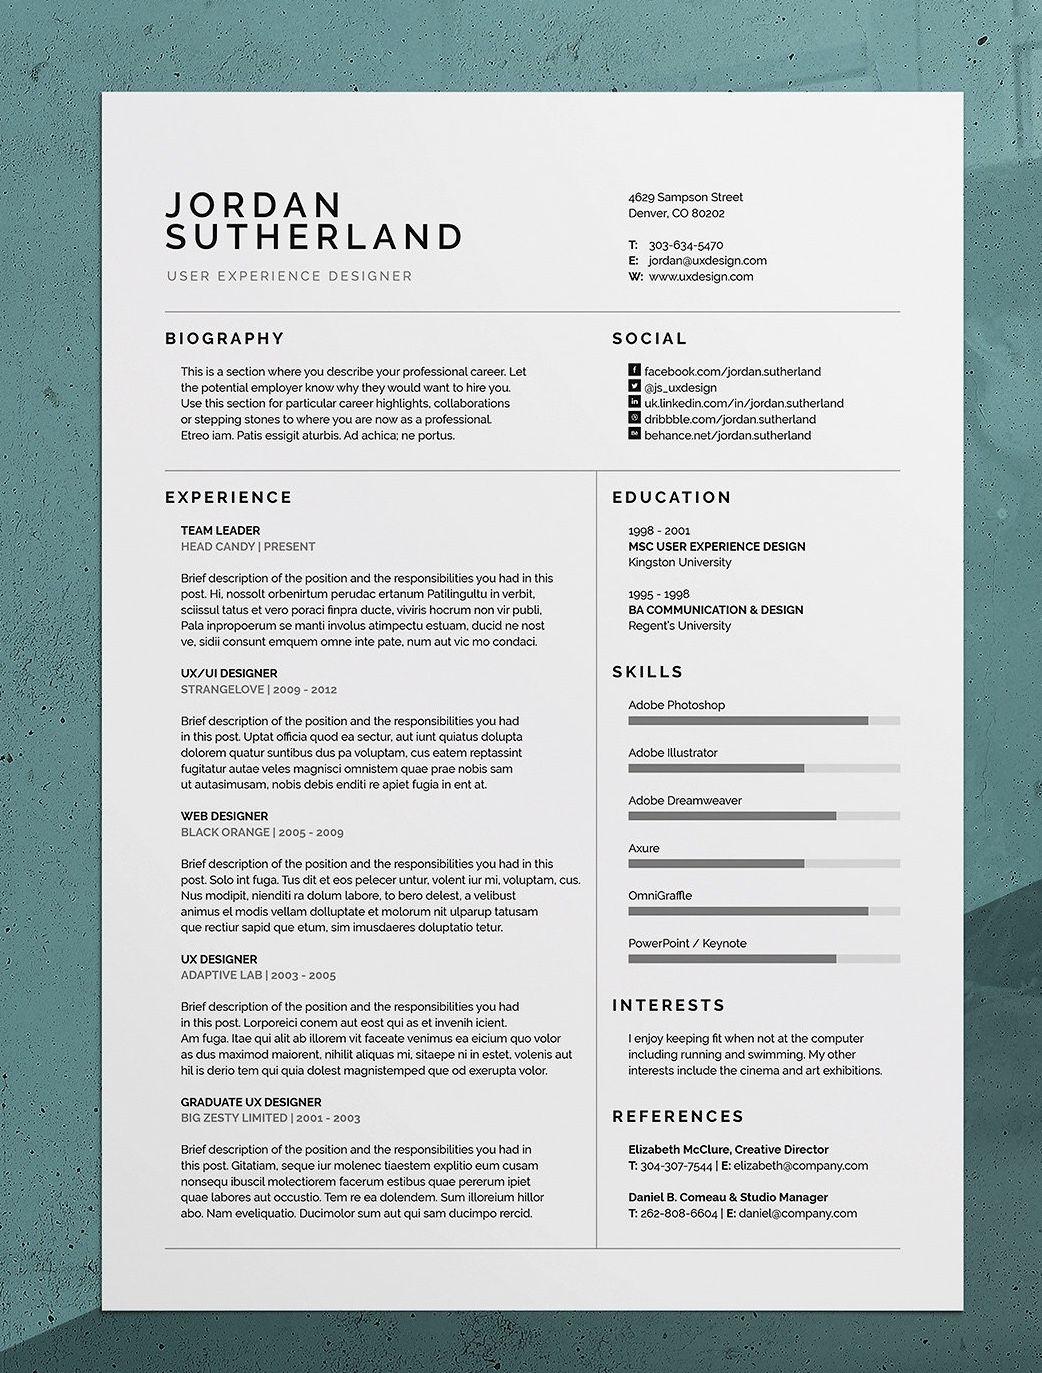 Pro Resume Cv Jordan Resume Design Resume Design Creative Resume Design Template